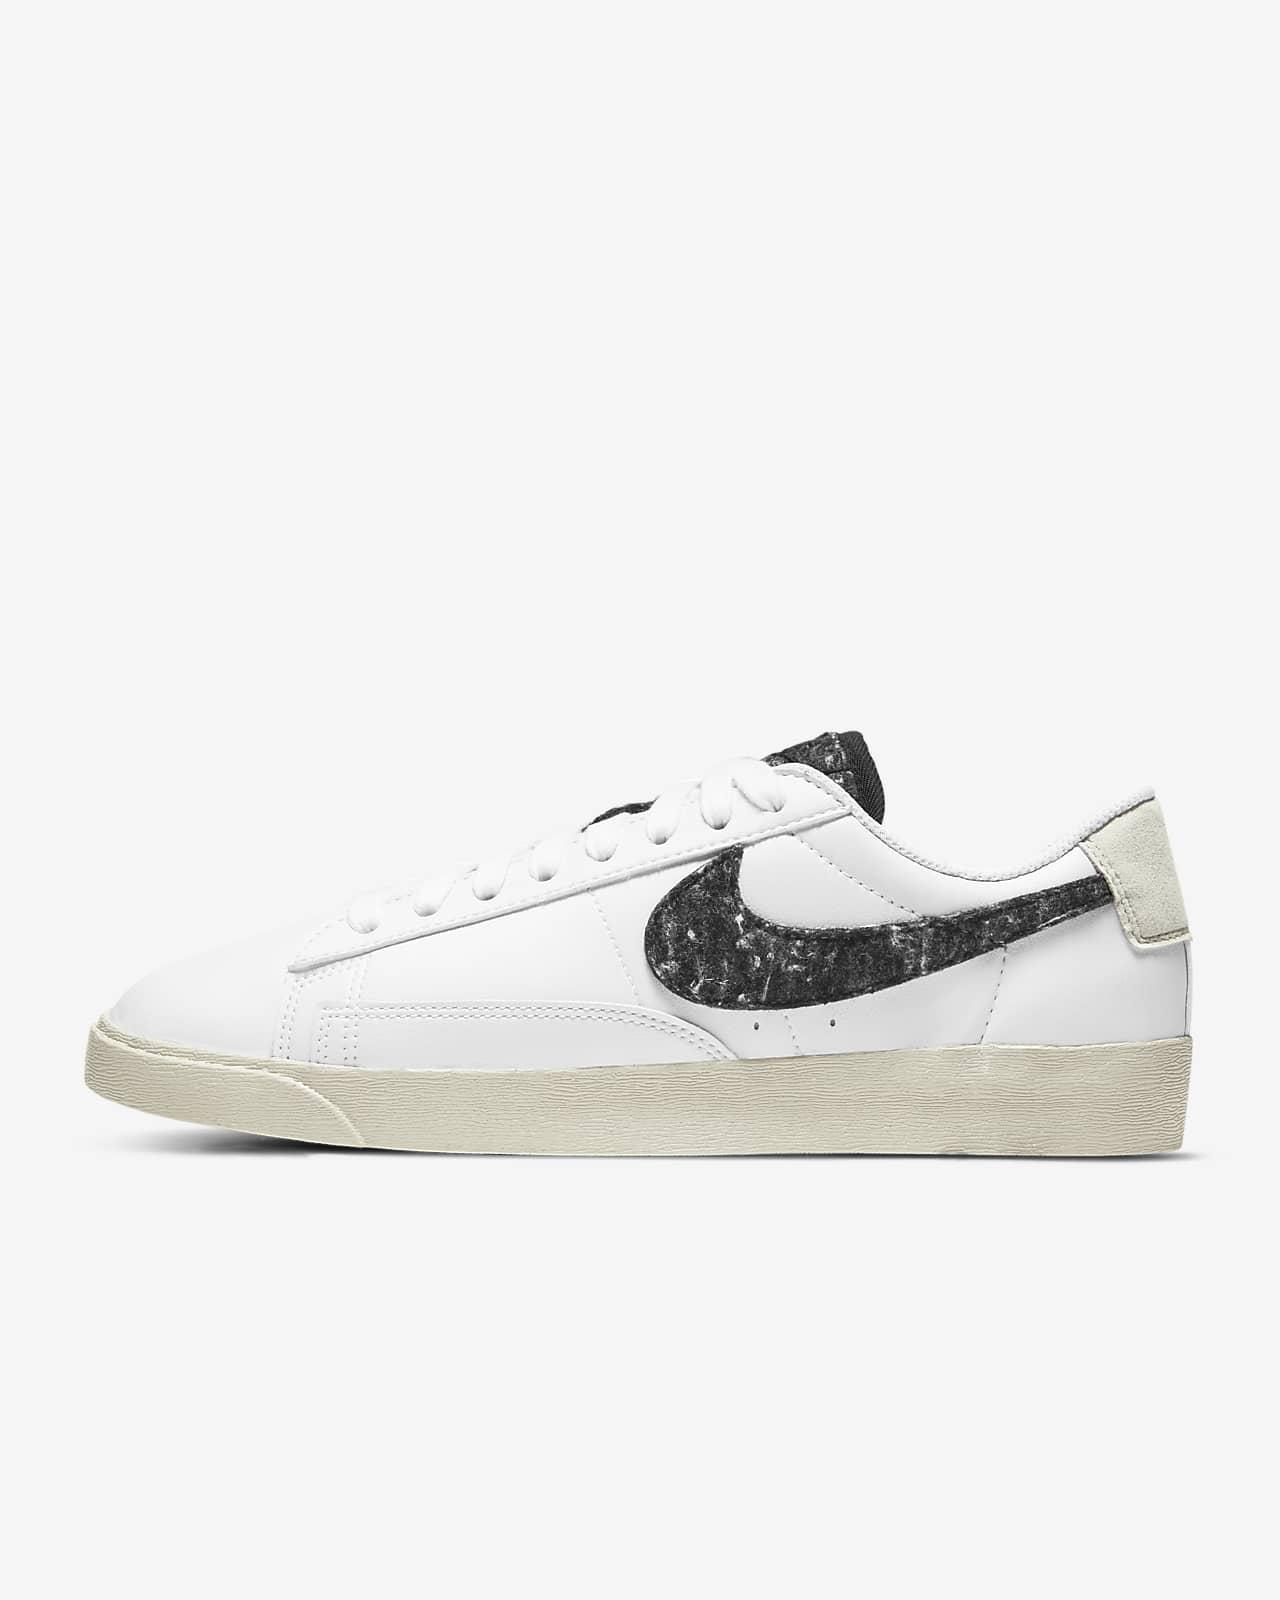 Women's Nike Blazer Low SE 'Recycled' .97 Free Shipping